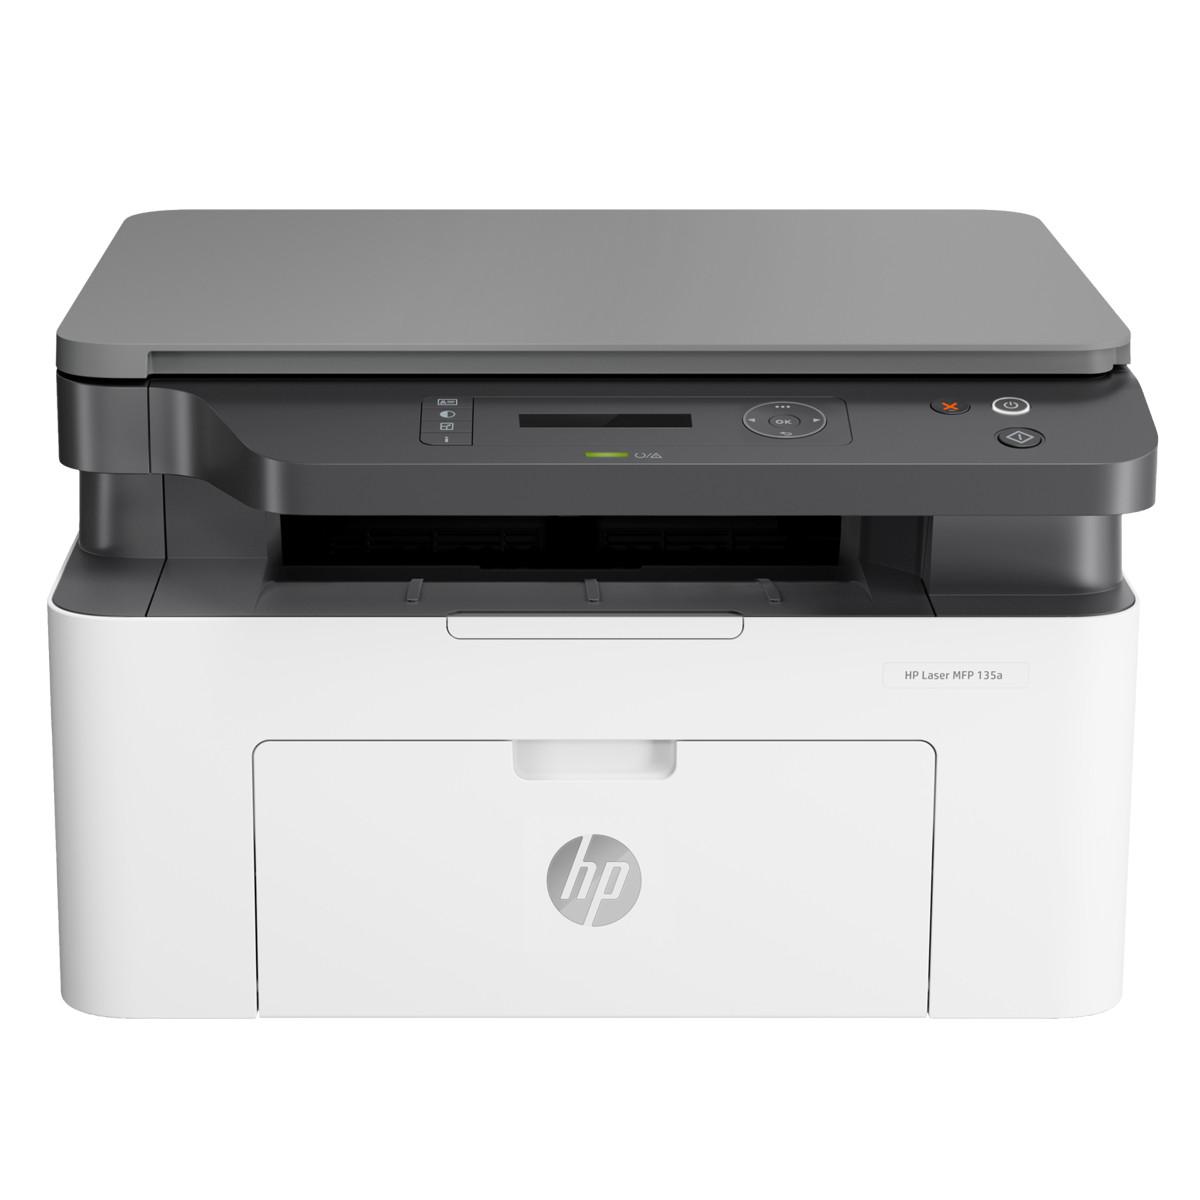 Impressora HP LaserJet MFP-M135A 4ZB82A Multifuncional com USB